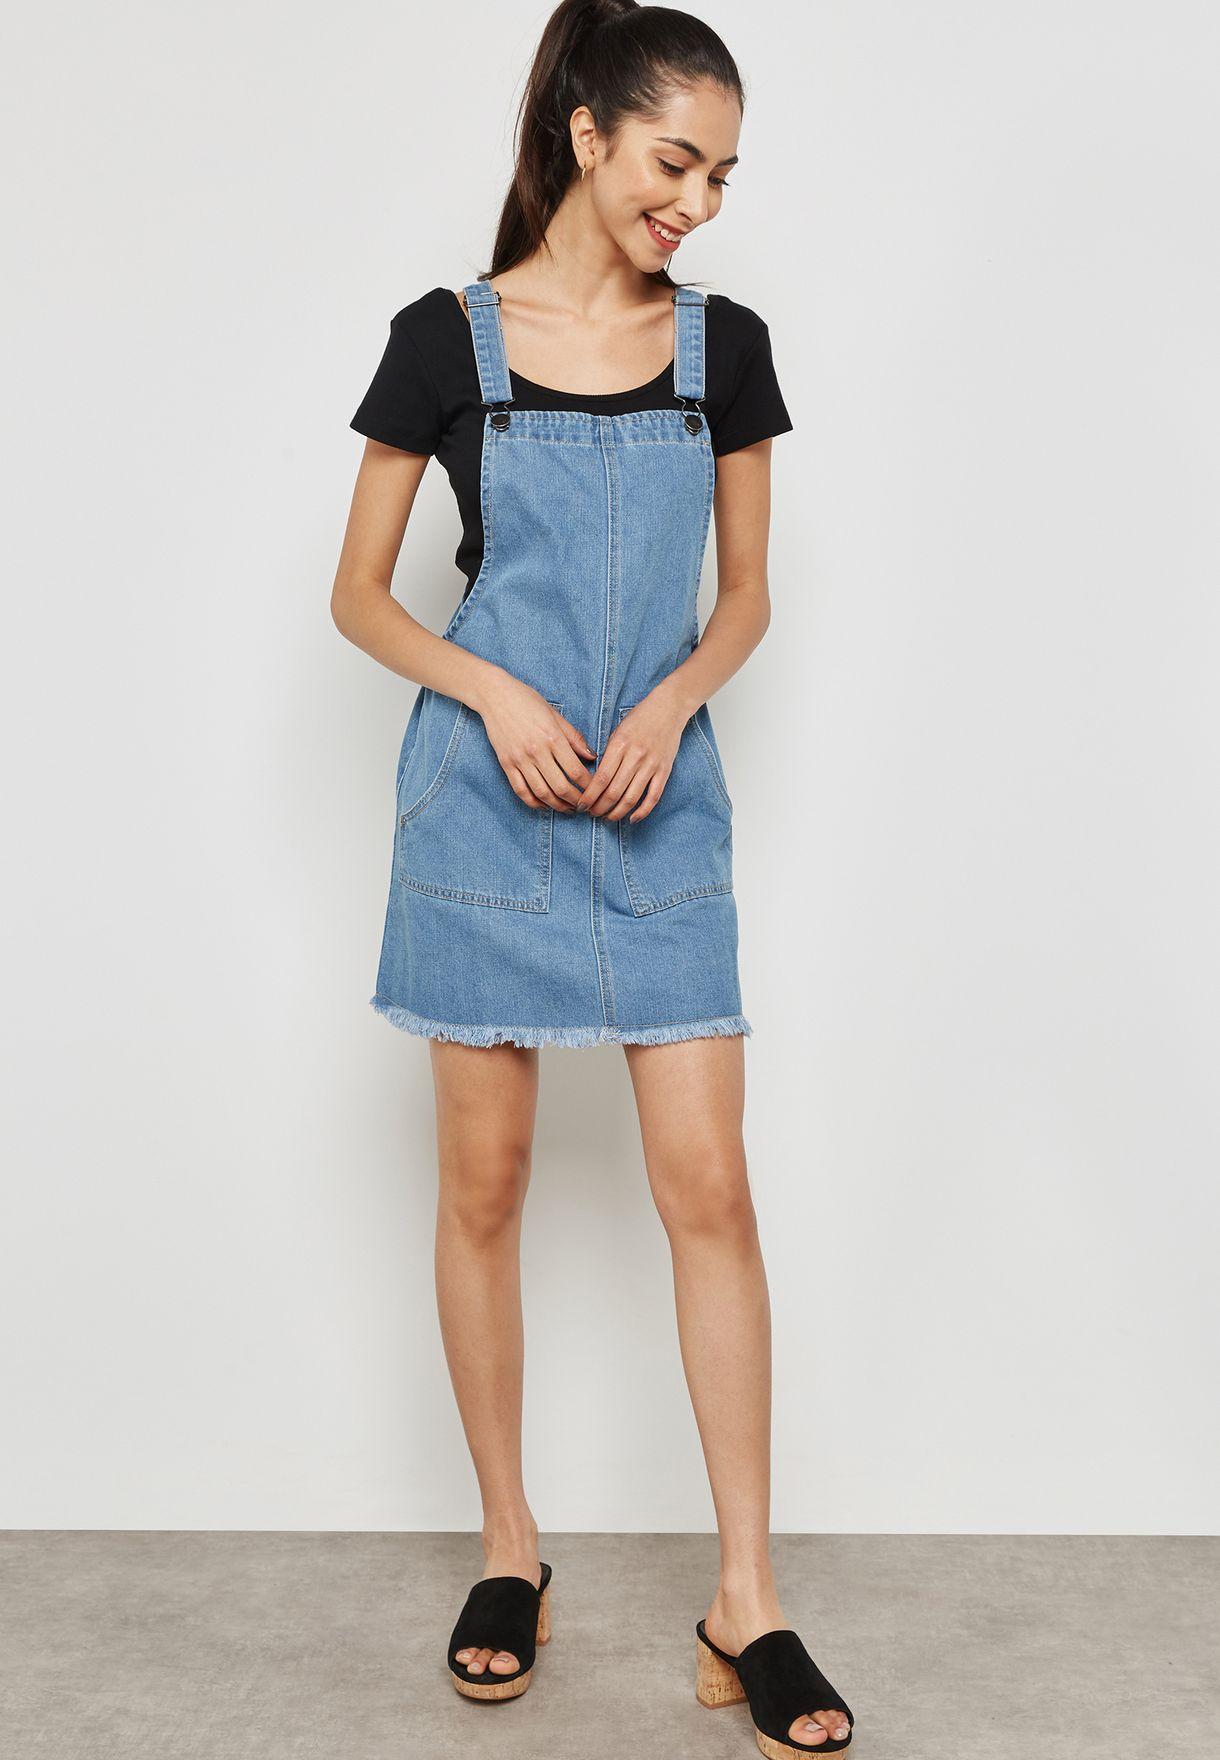 فستان جينز قصير بحمالات